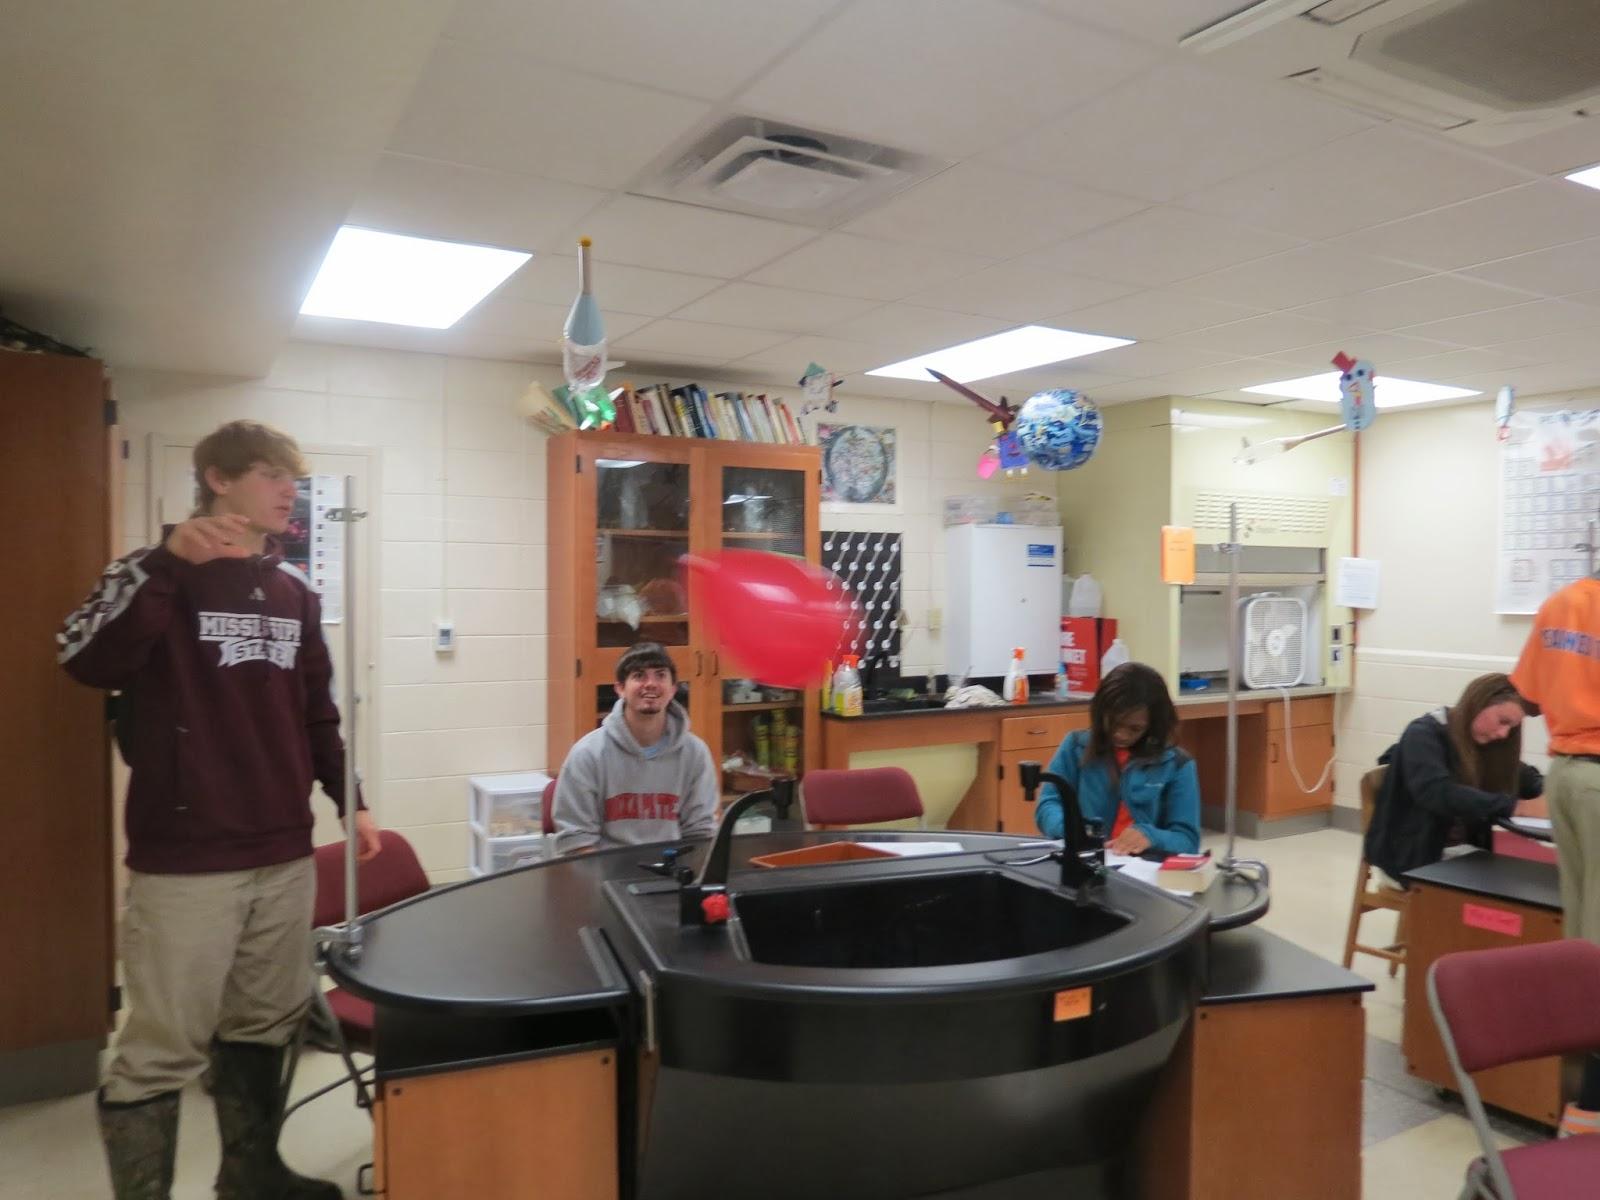 Louisville High School Students Testing Newton S 3rd Law